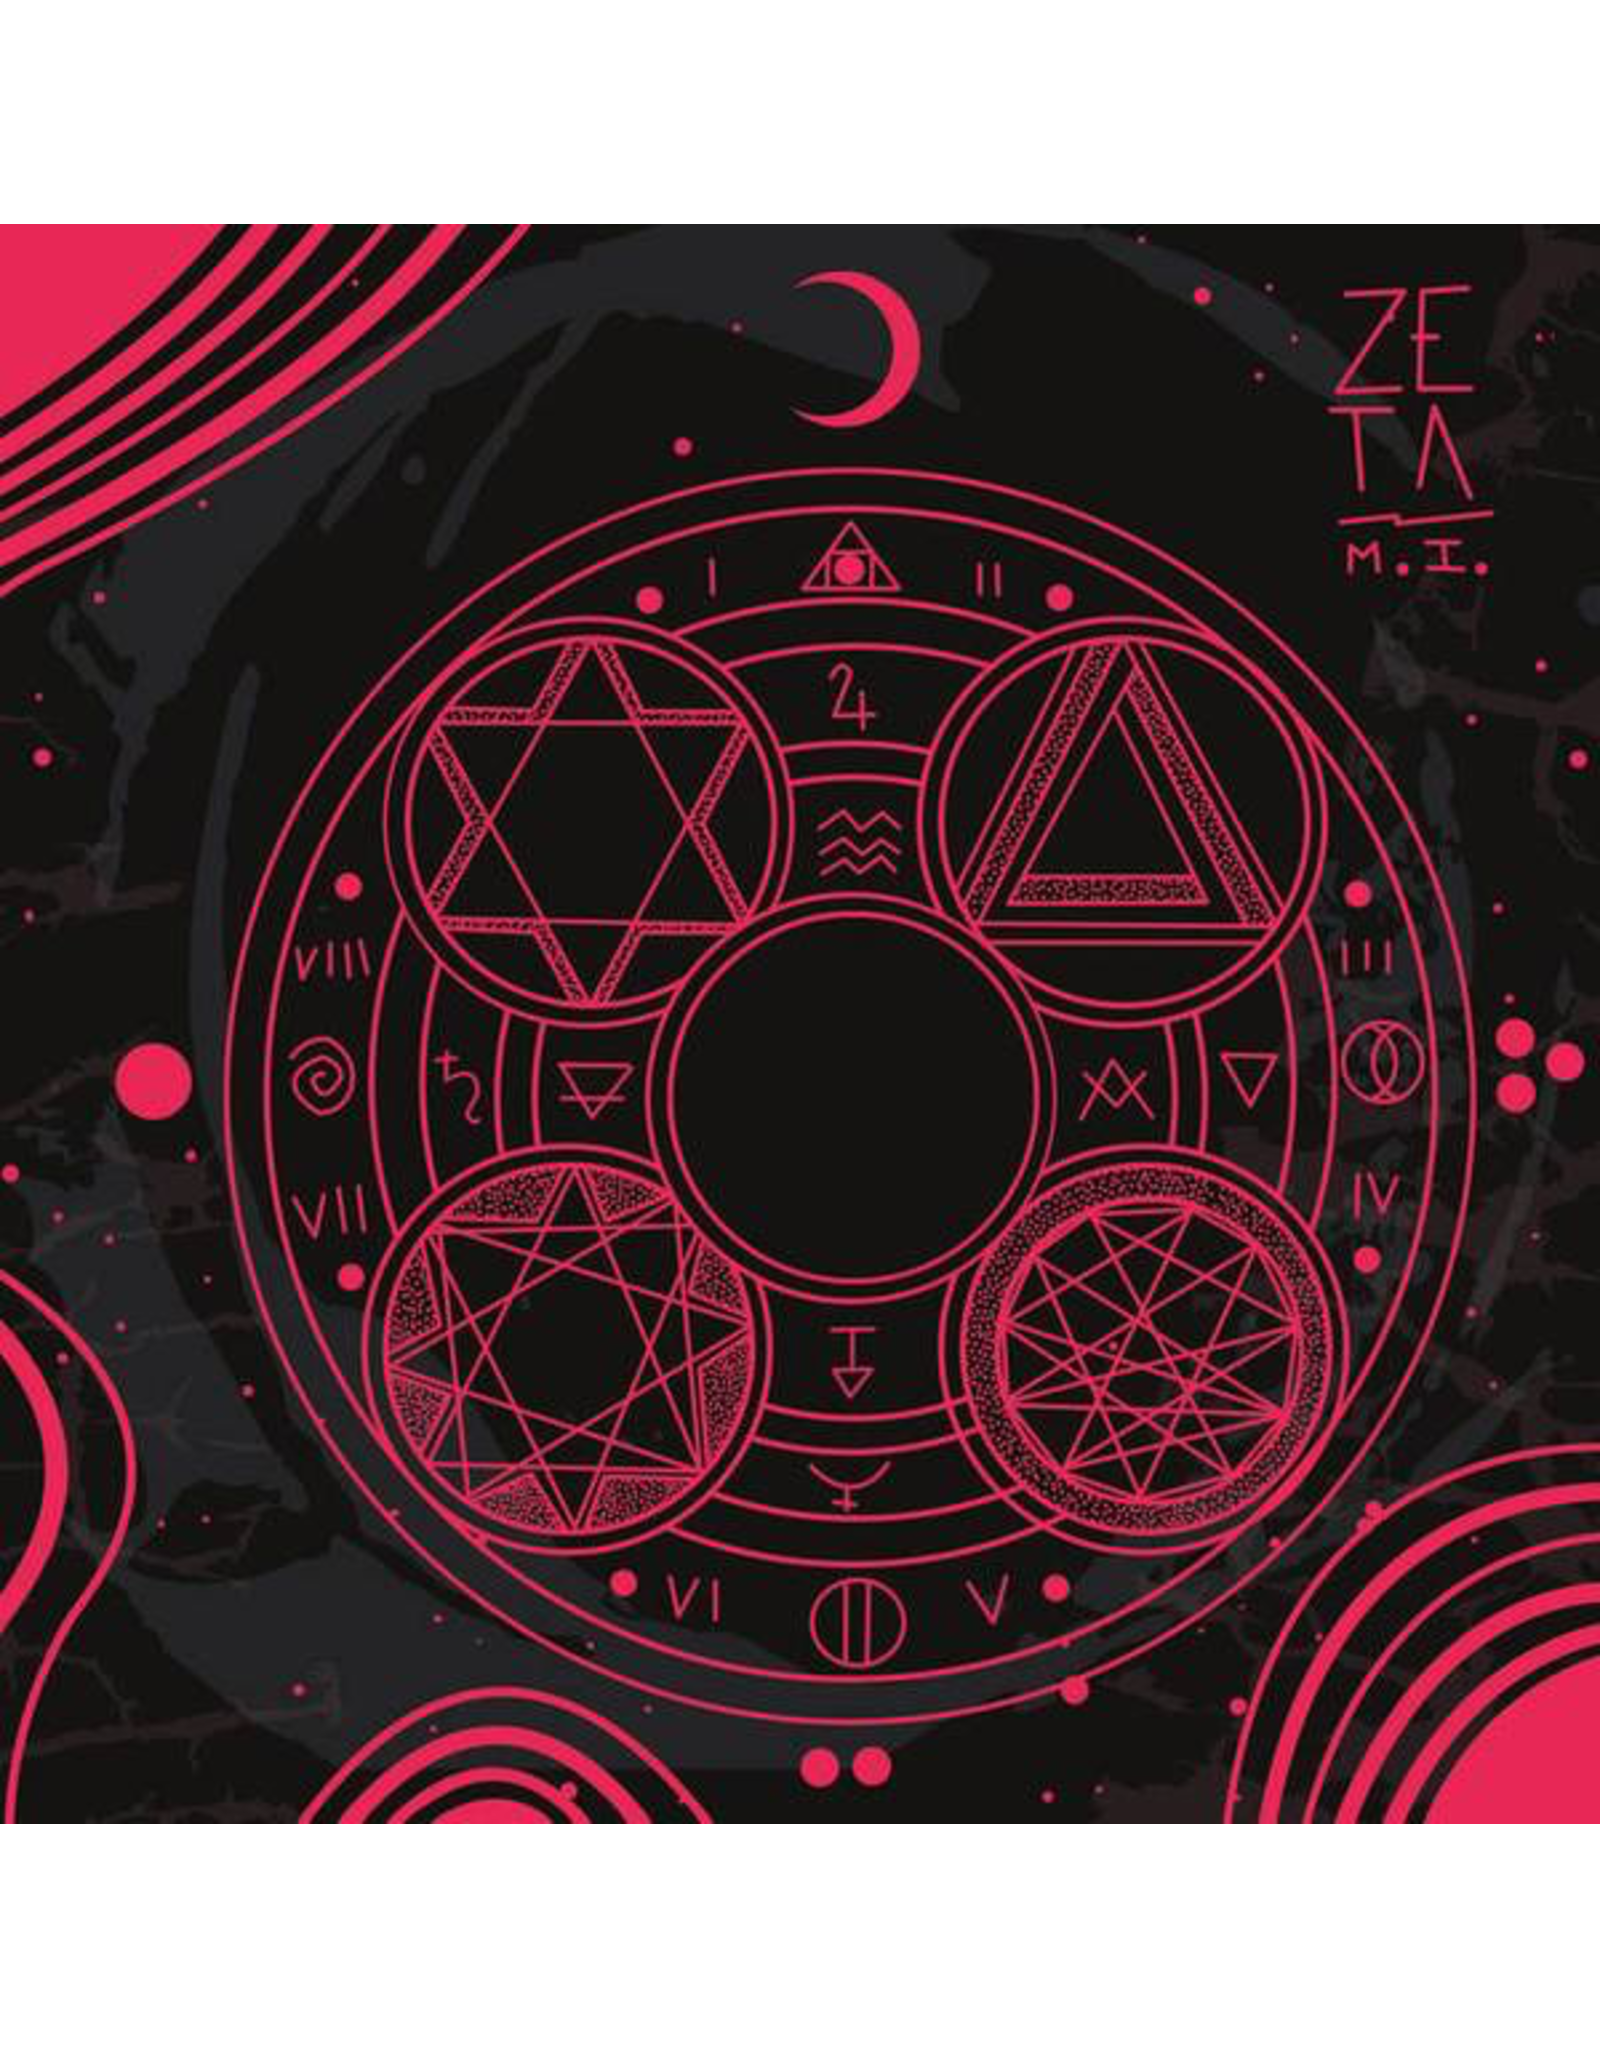 New Vinyl Zeta - Magia Infinita LP